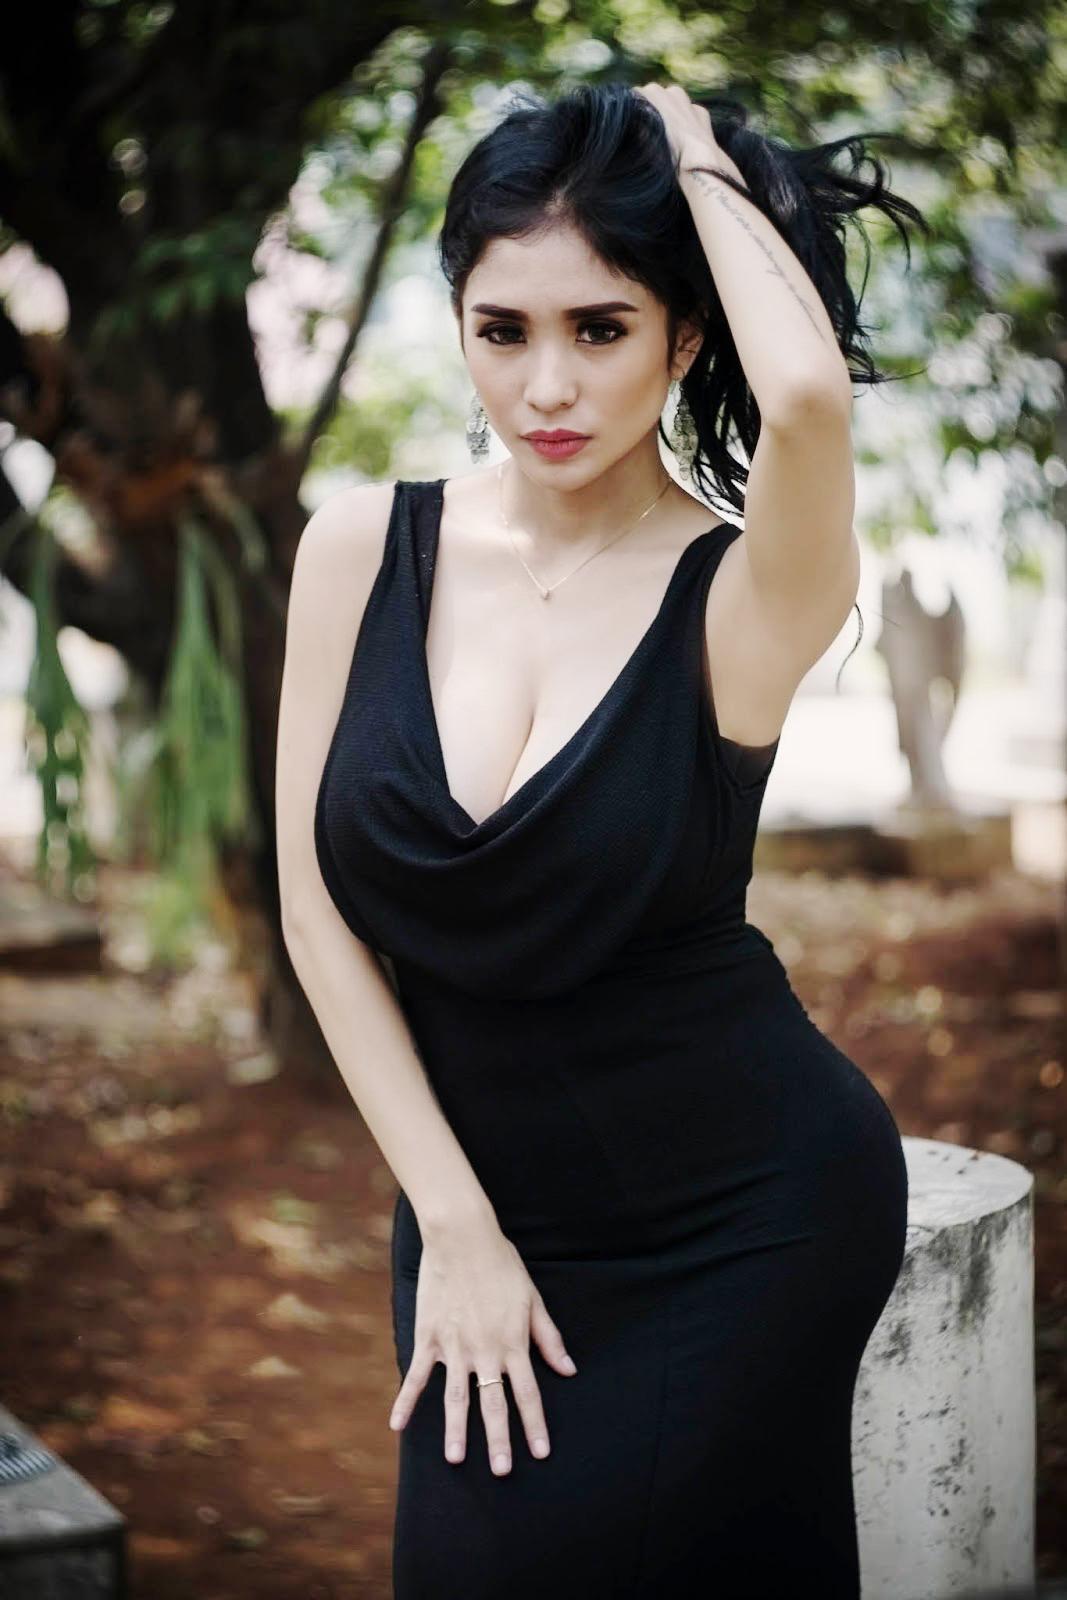 Foto Terbaru Artis pemain FTV Cewek IGO peremupan Cantik Bibie Julius Aka Nadia Ervina collection Fotografi hunting